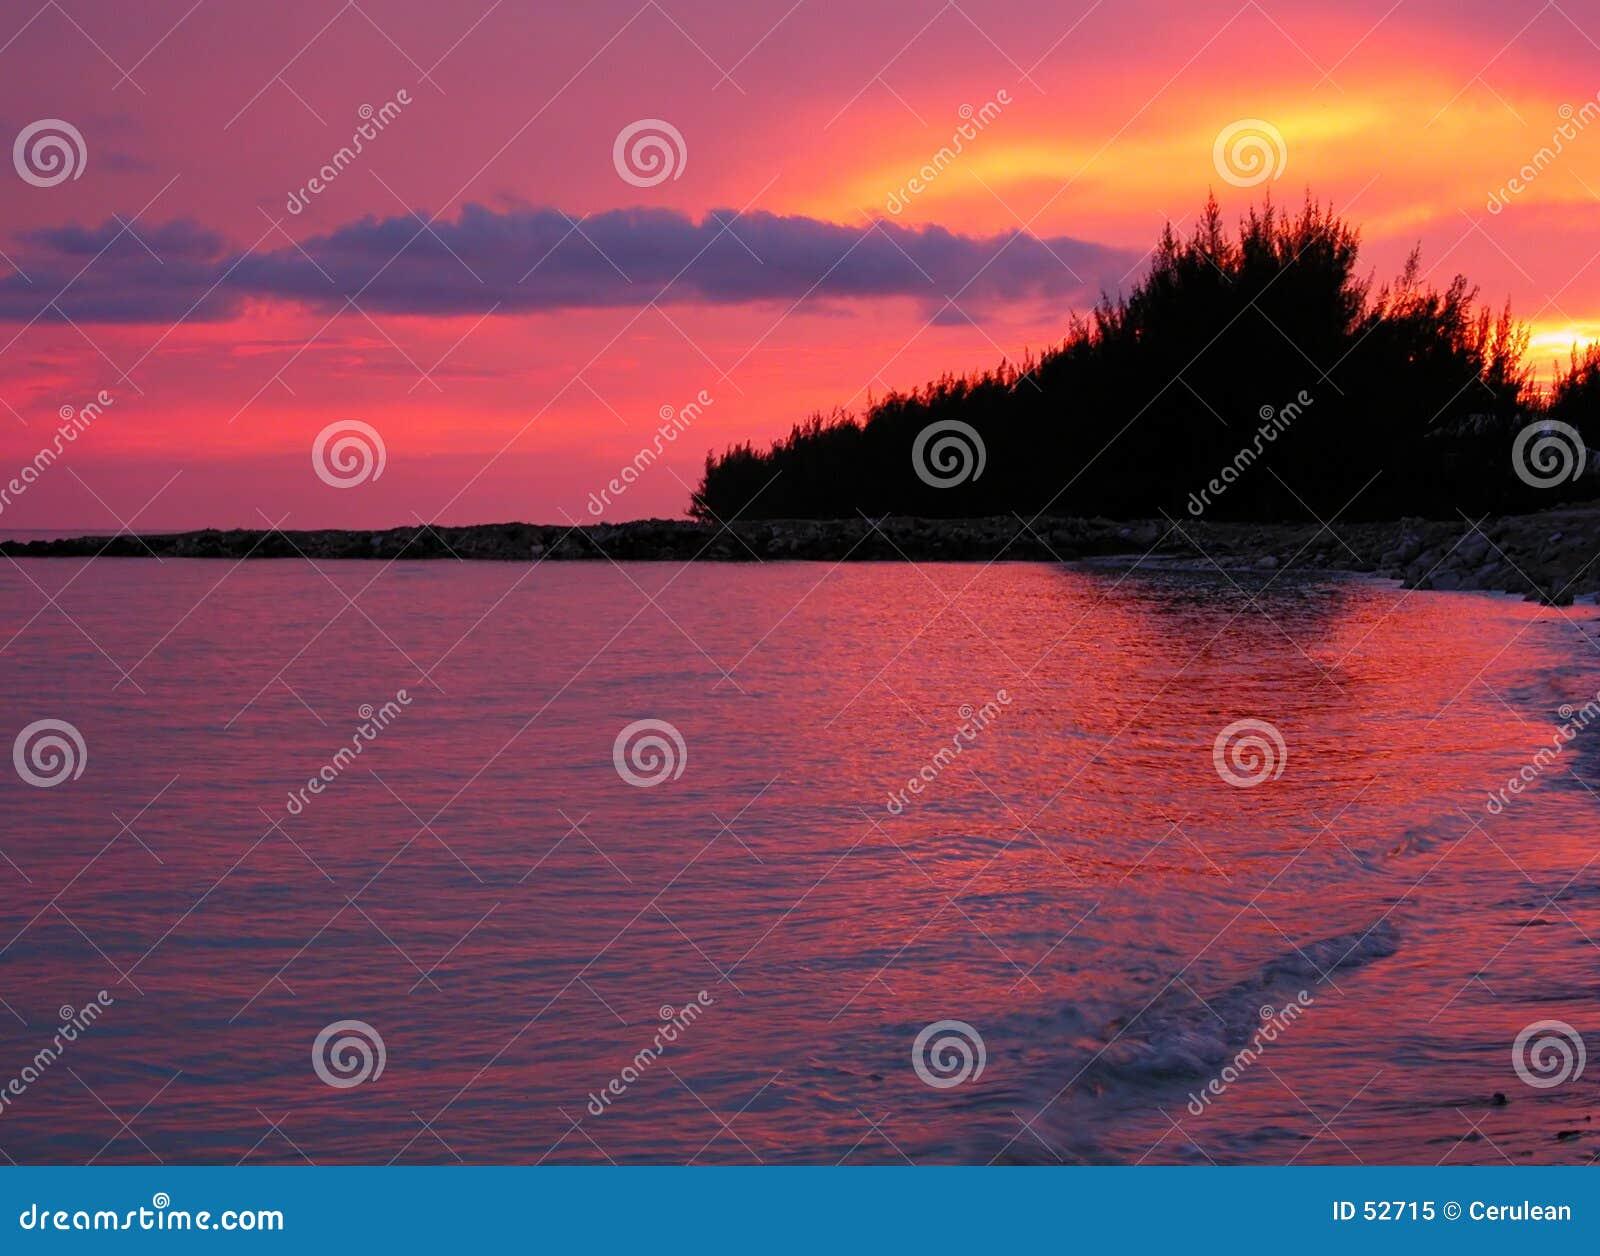 Download κόκκινο ηλιοβασίλεμα στοκ εικόνα. εικόνα από όνειρο, όραμα - 52715